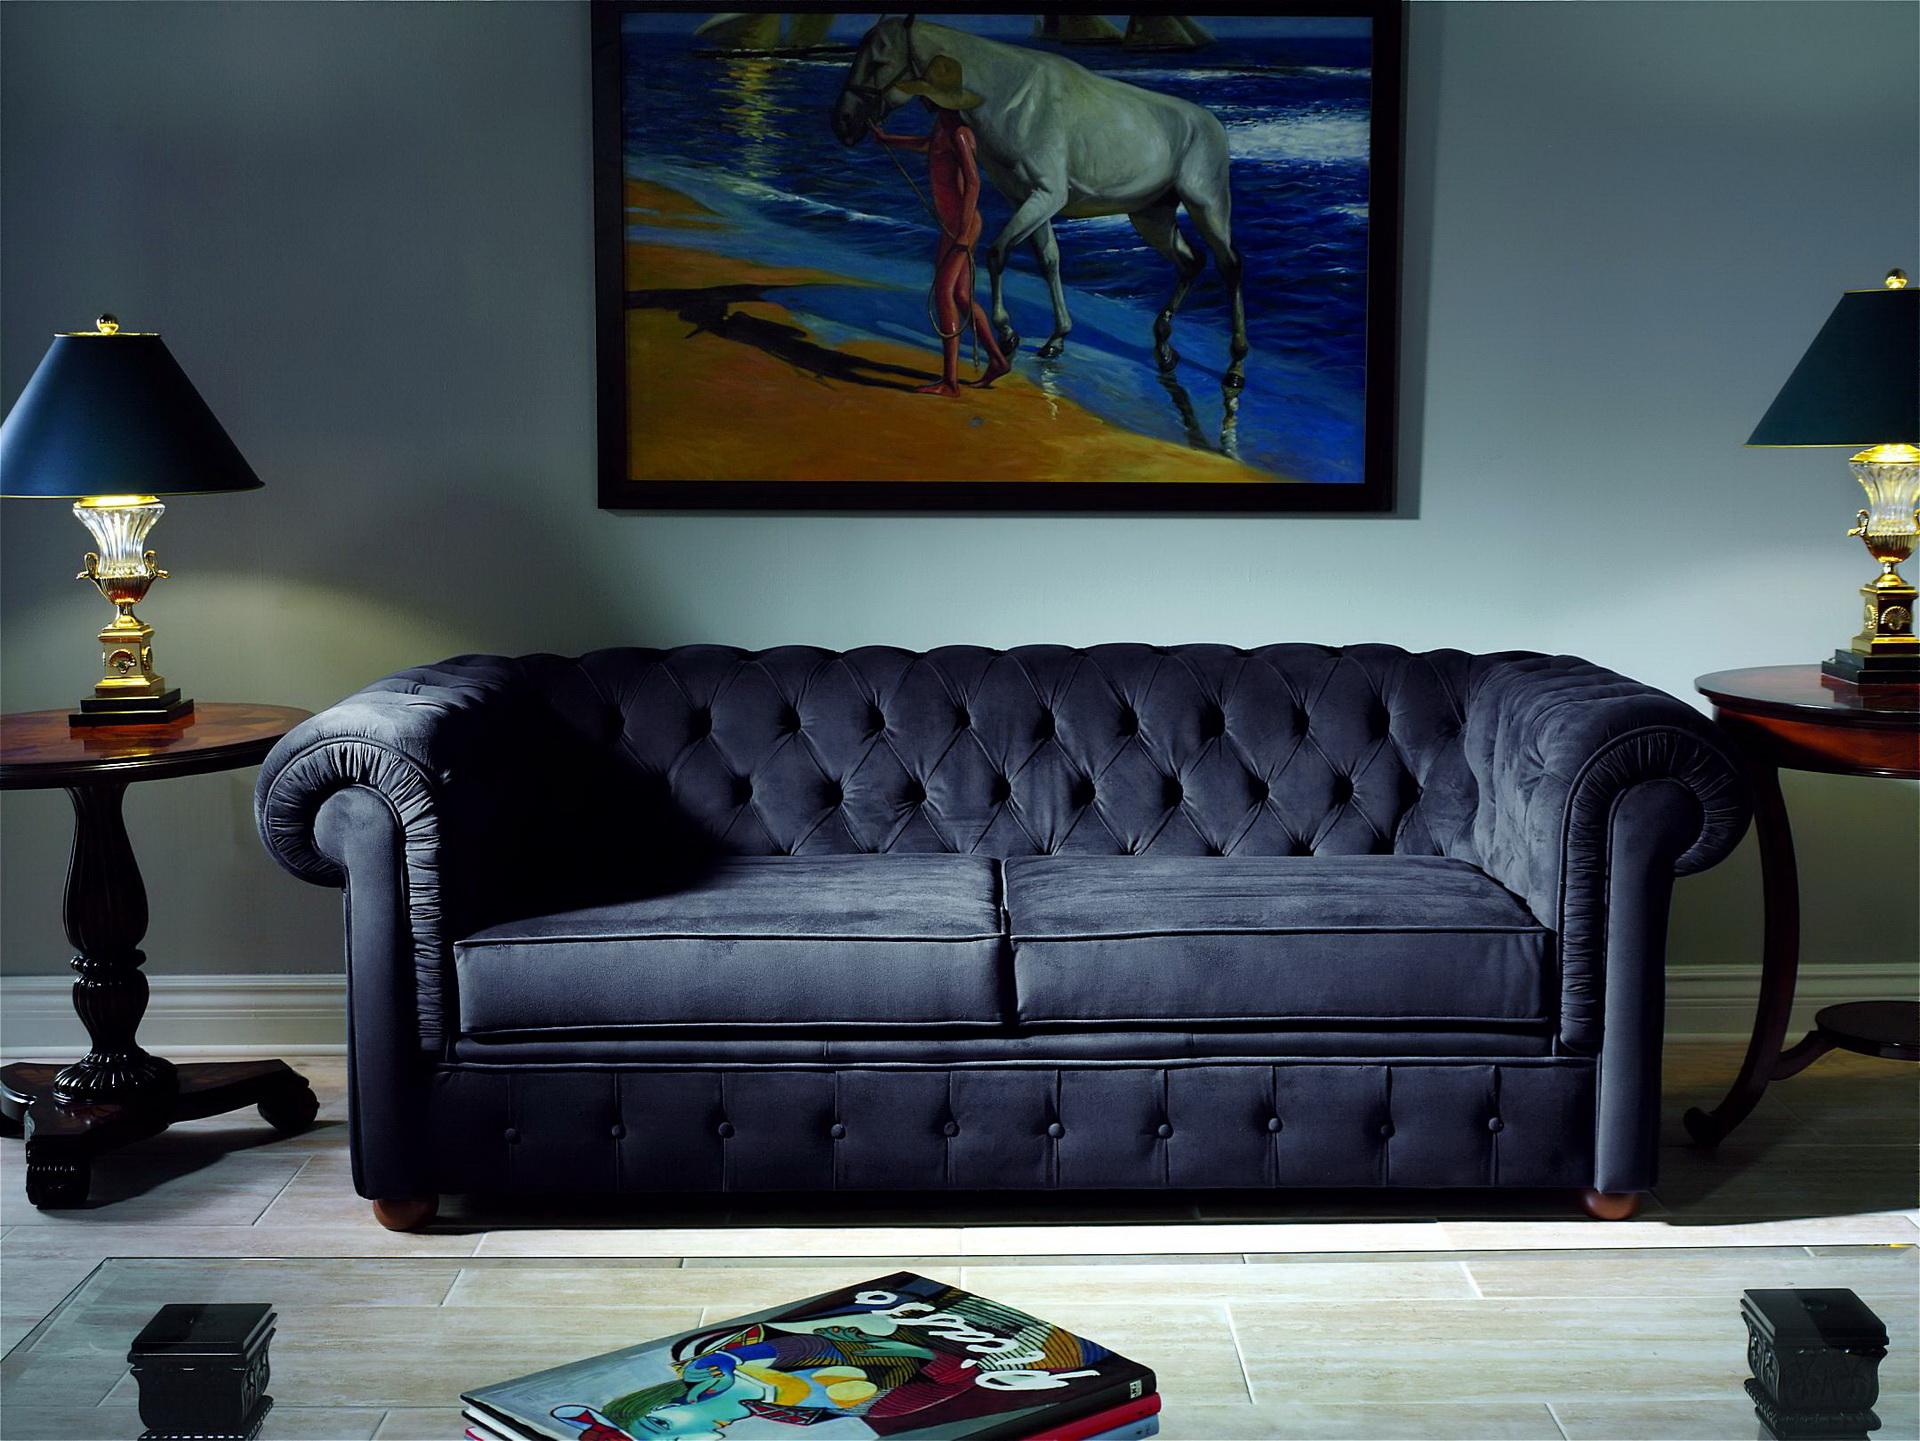 Sofa Chester 3 seat by Hurtado Furniture en muebles antoñán® León